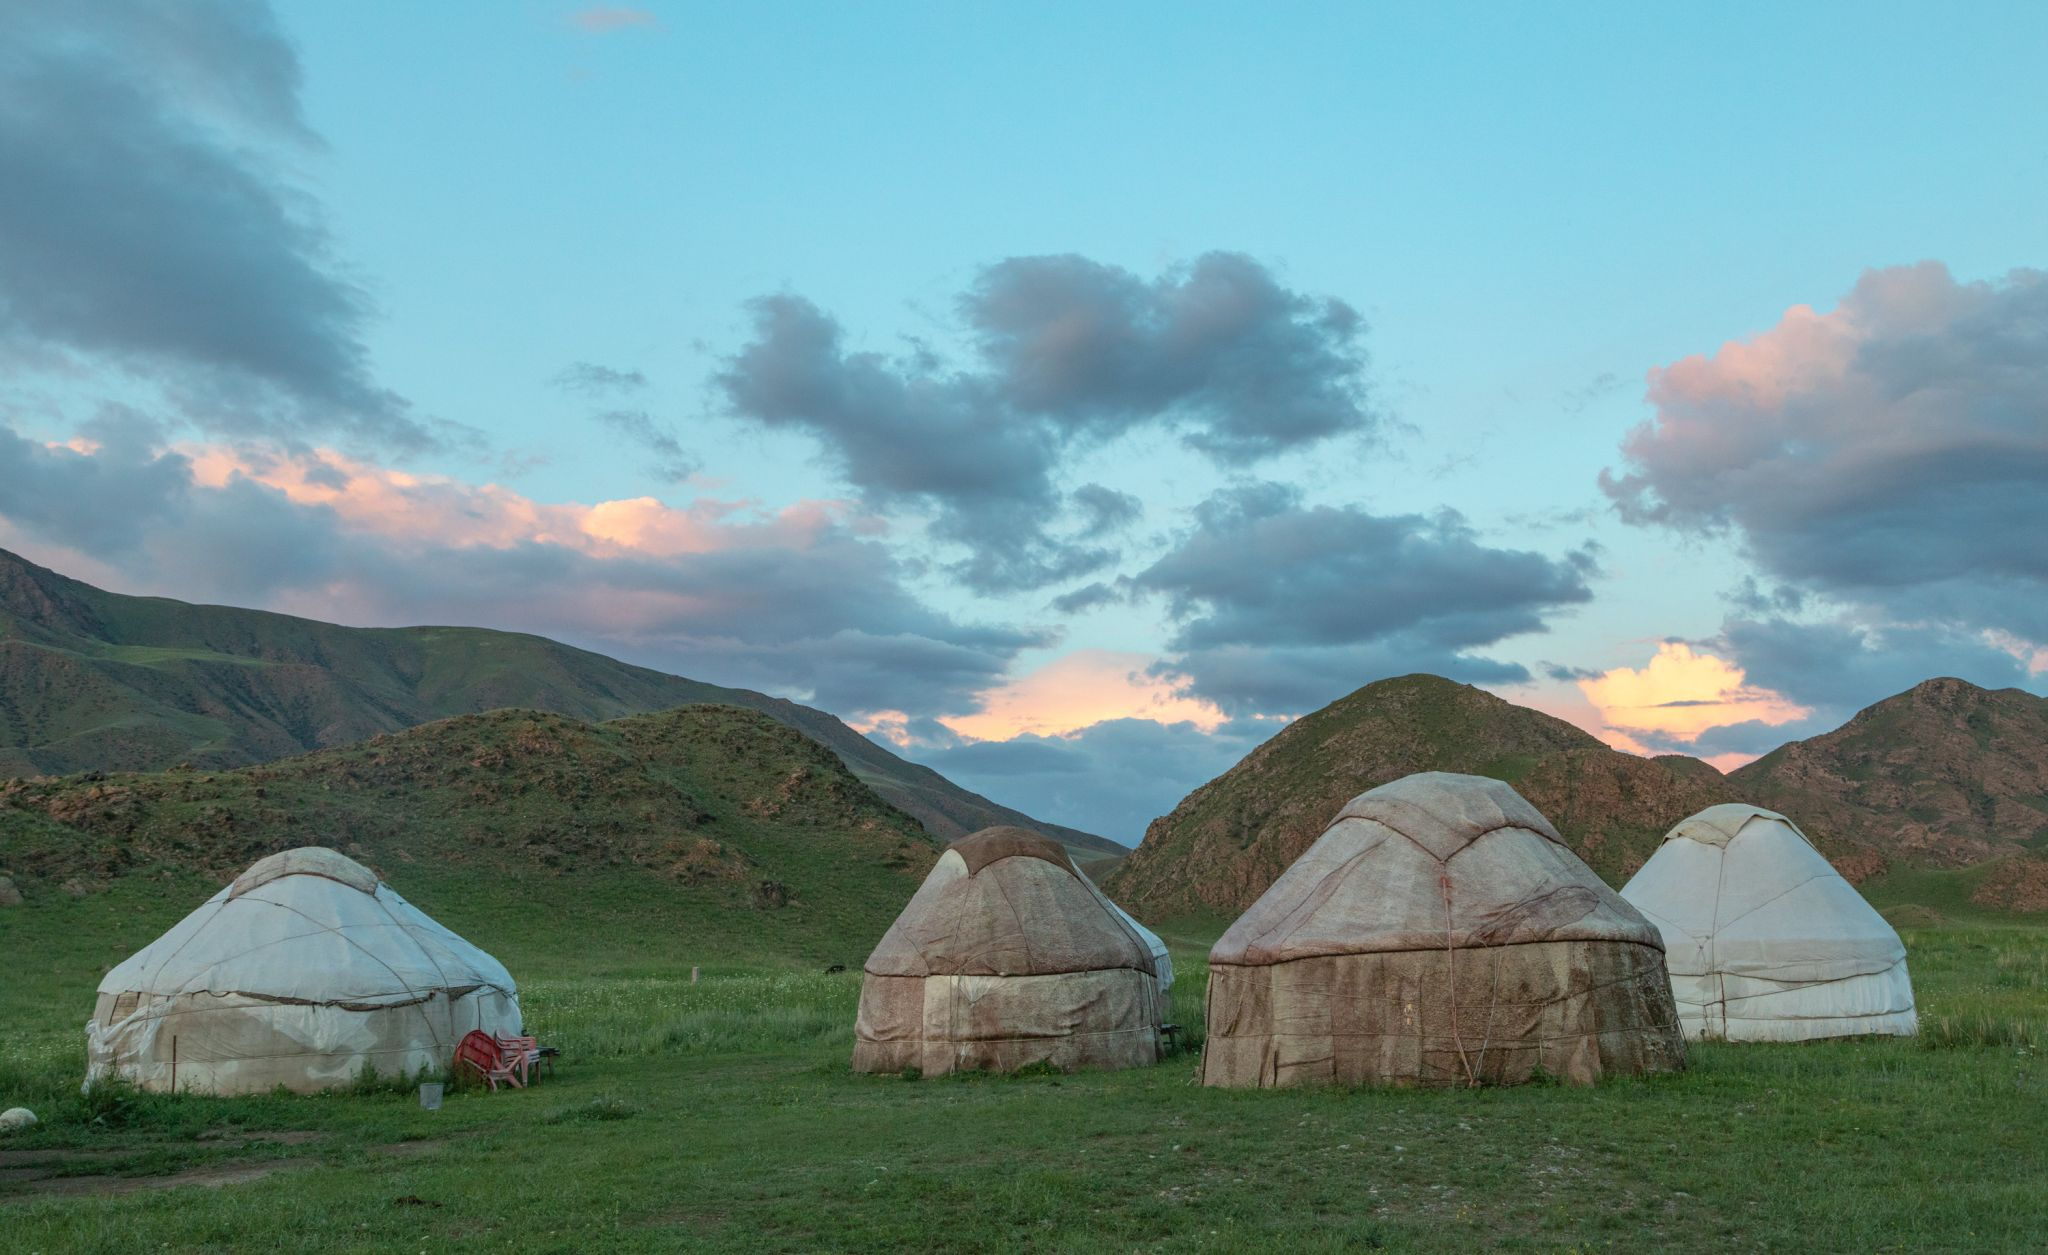 Jurtencamp Tuura Suu, Kyrgyz Republic